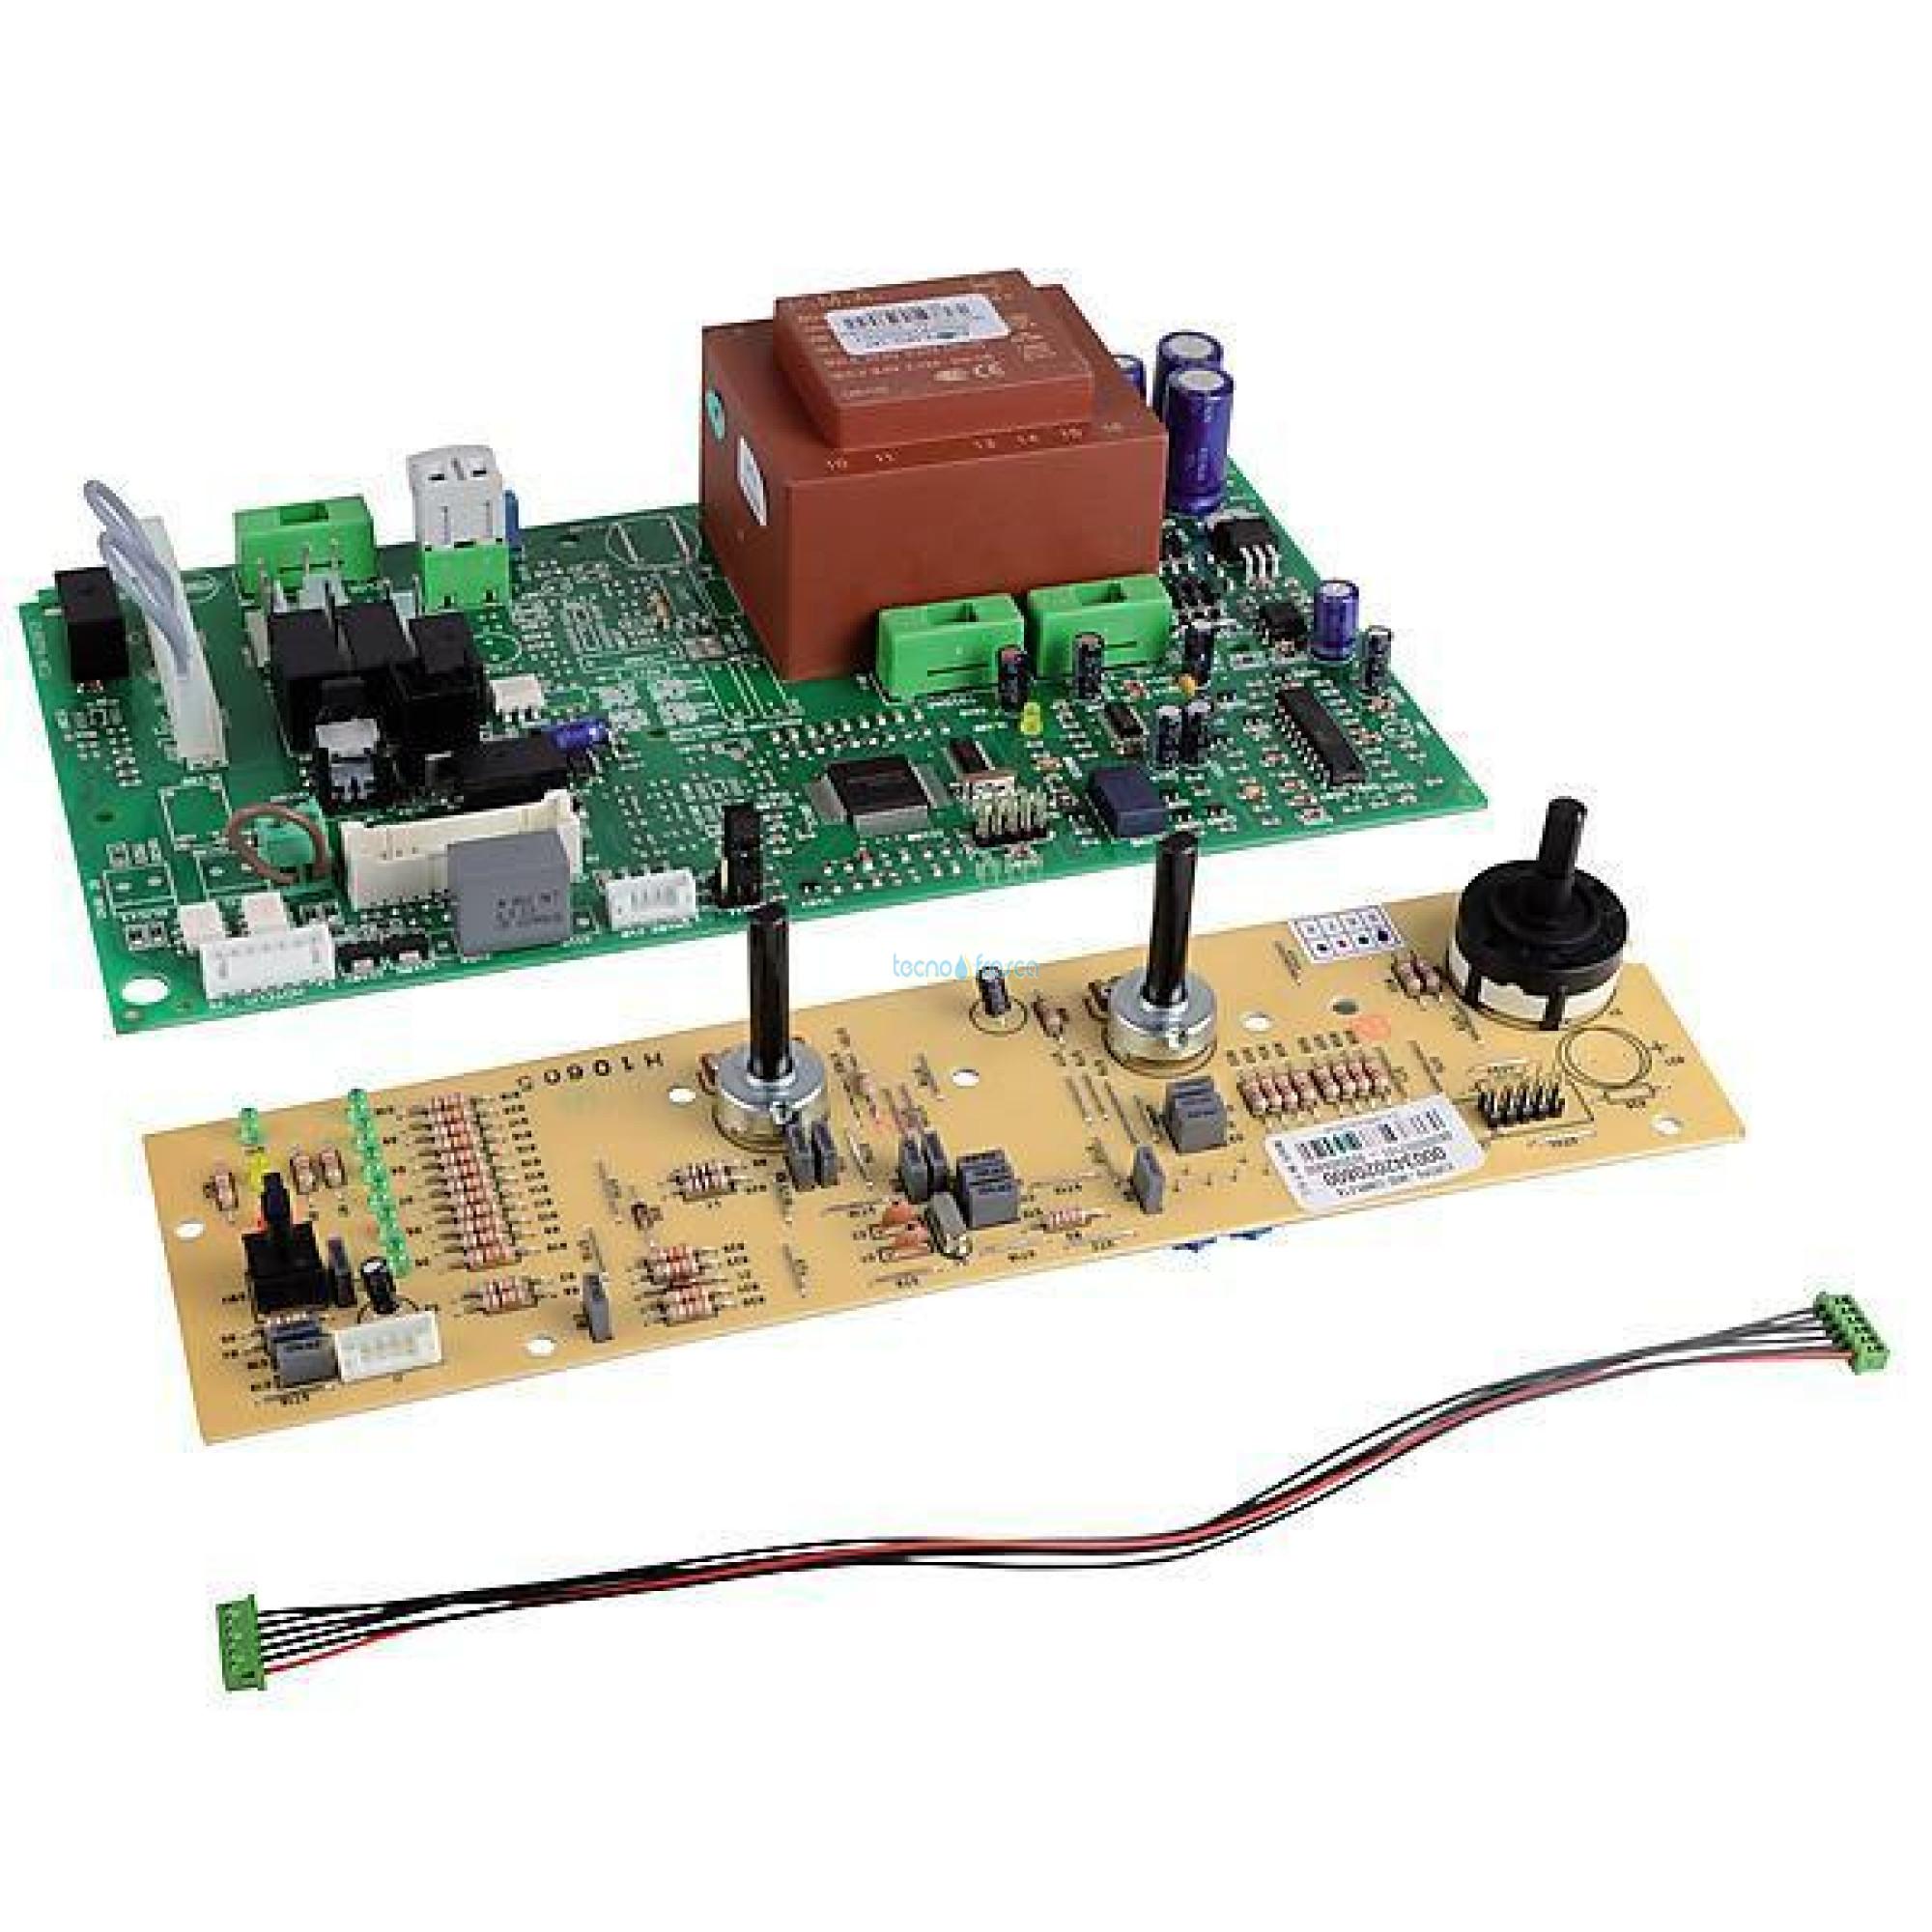 Chaffoteaux circuito stampato centora 2.28 61308277